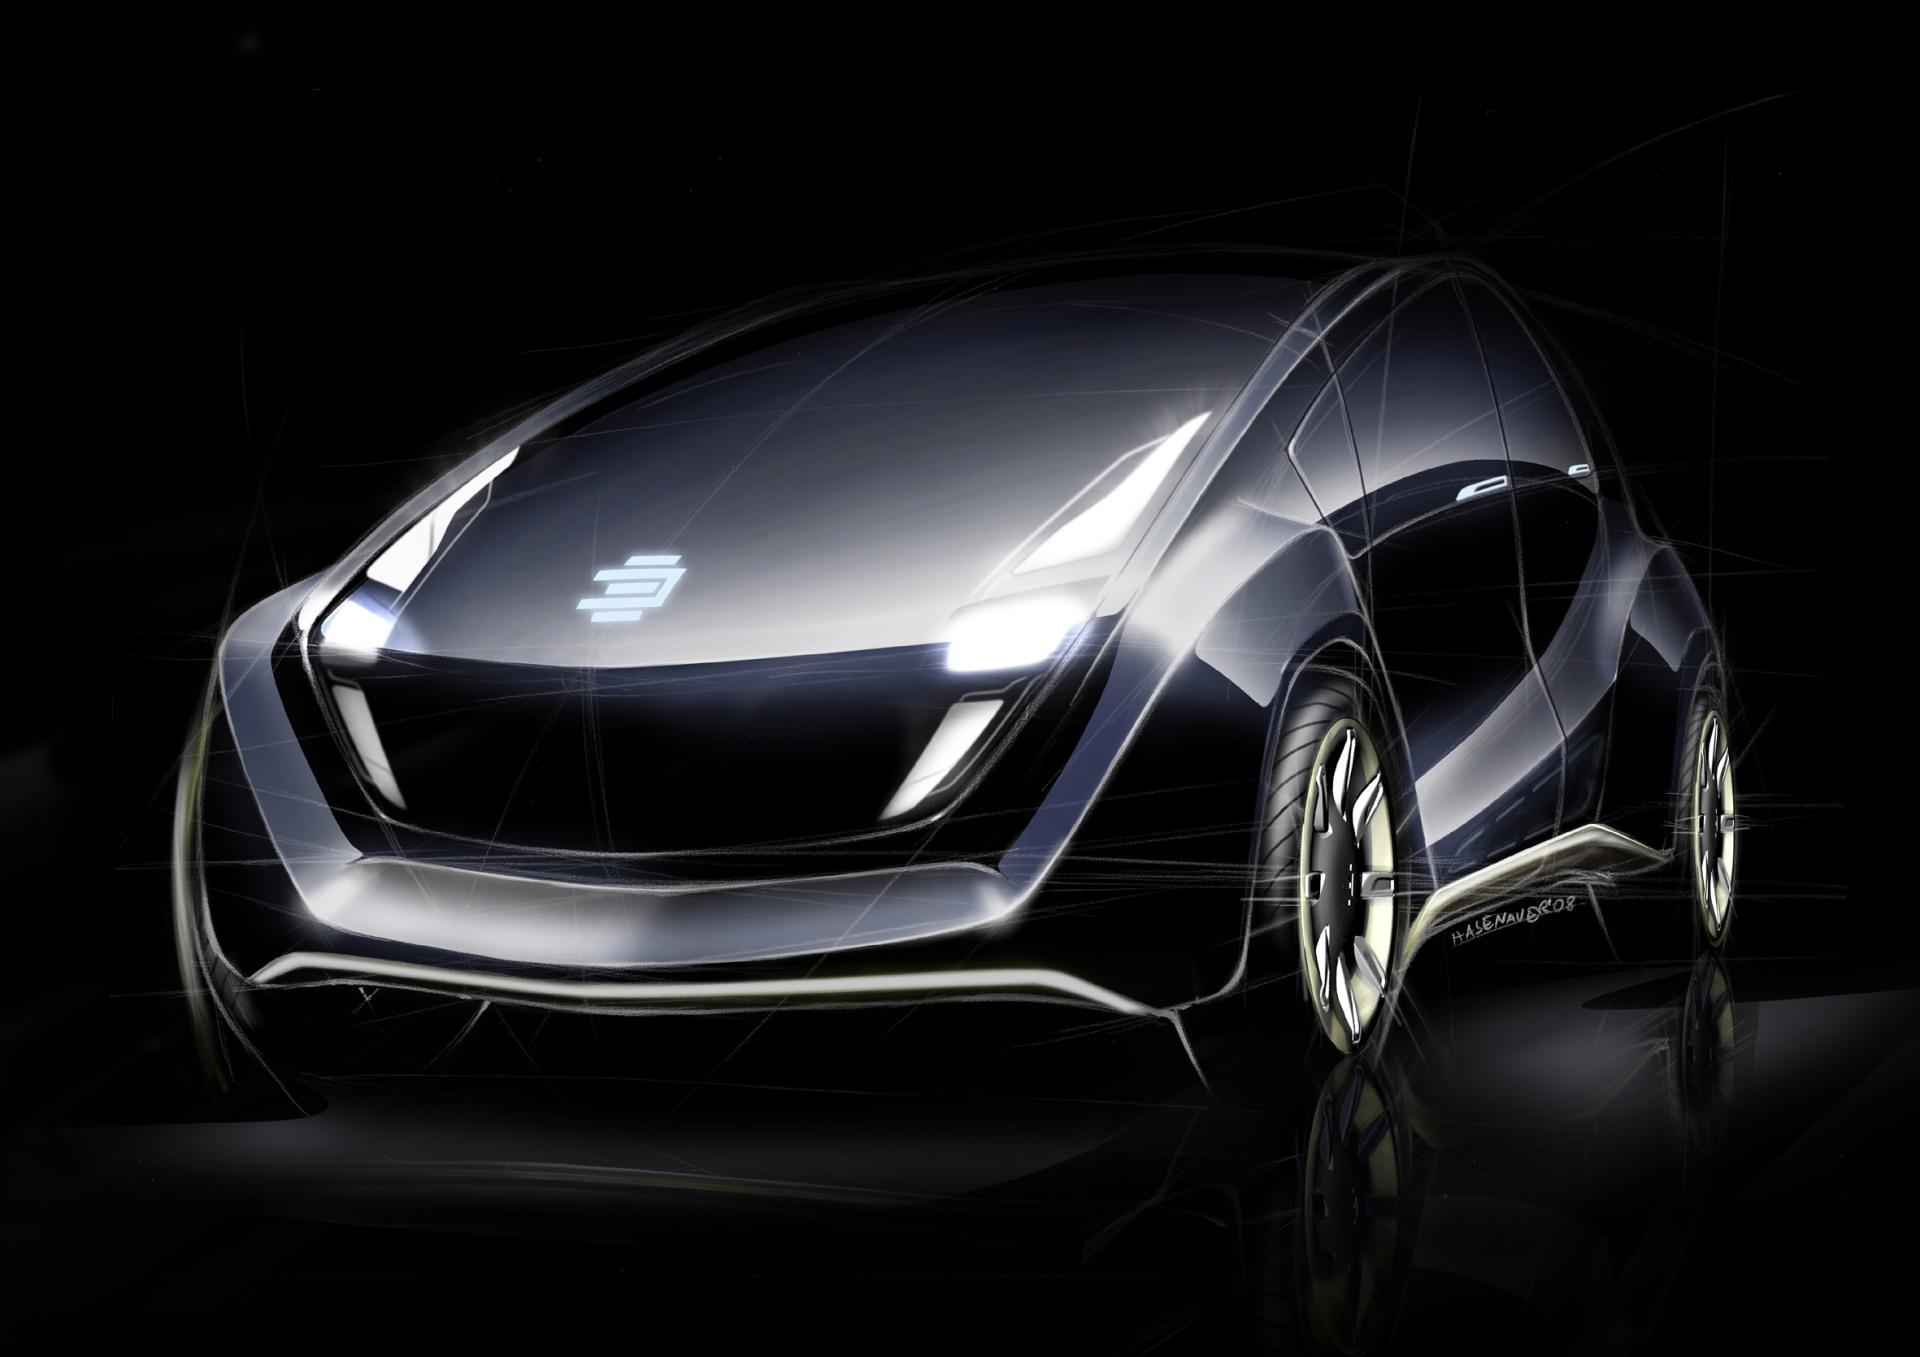 Dodge Muscle Car Wallpaper 2009 Edag Light Car Open Source Concept News And